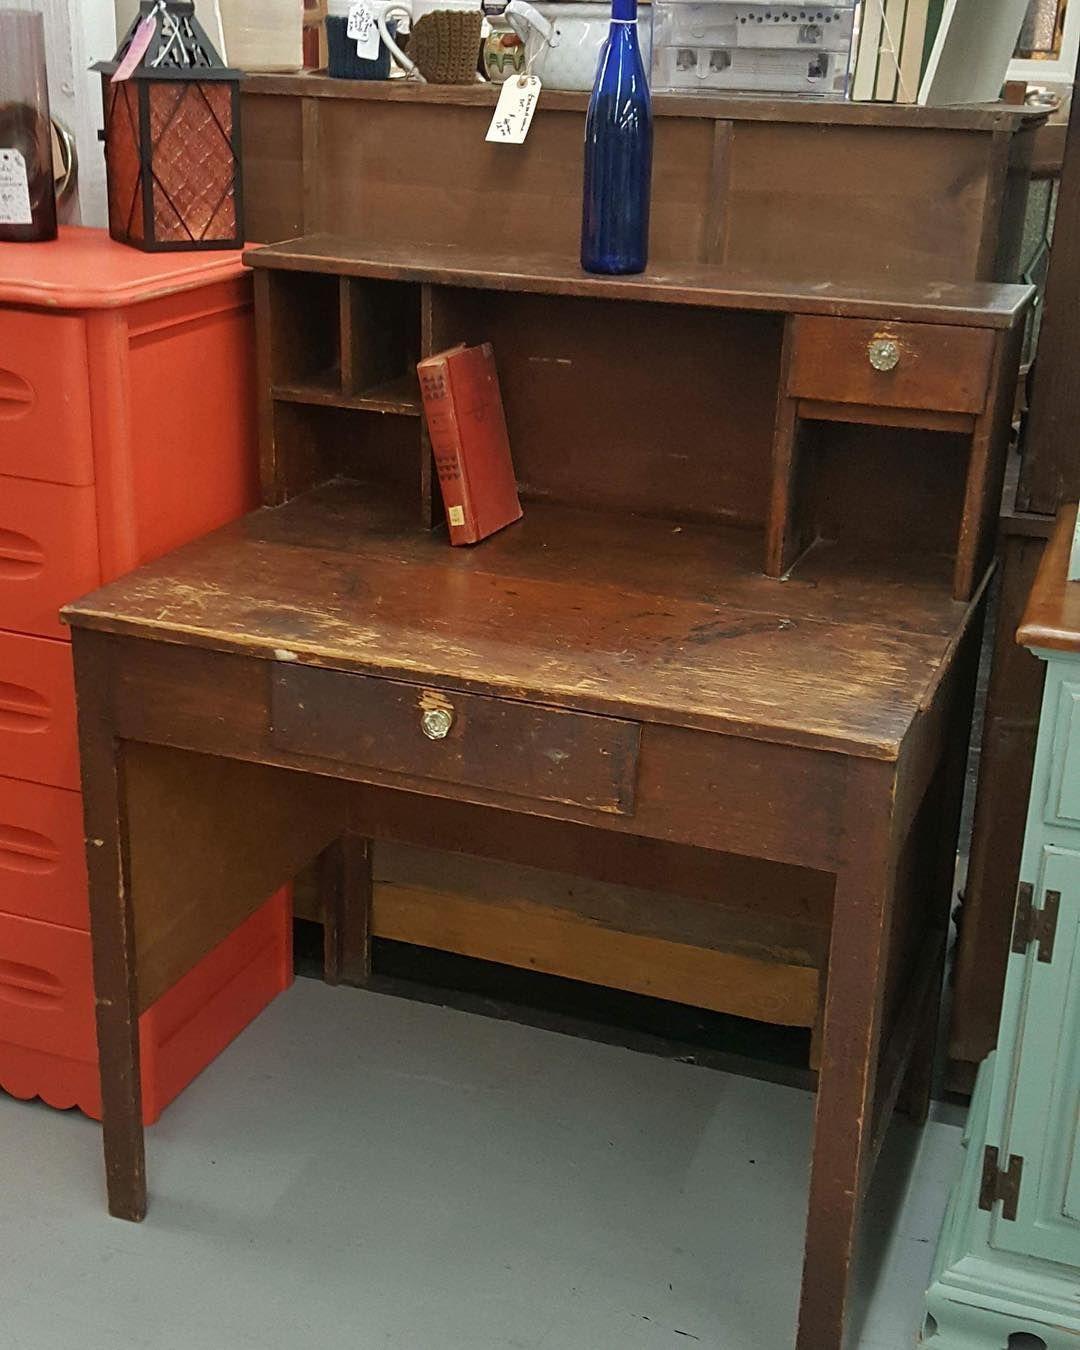 Home Deskdecor Ideas: #primitive #desk # Deskdecor #vintage #rusticdecor